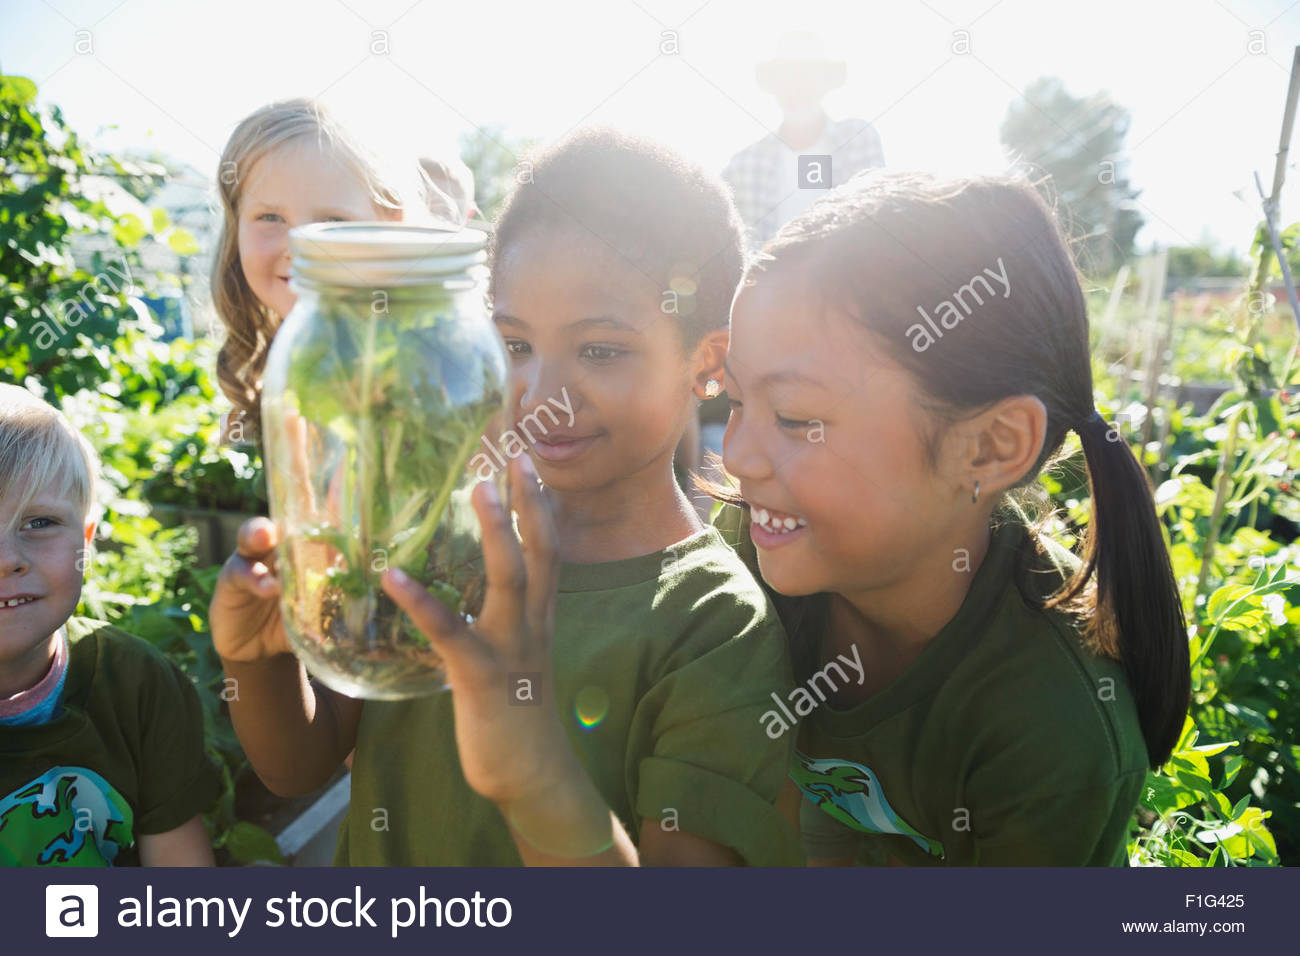 Curioso ragazze esaminando impianto jar giardino soleggiato Immagini Stock